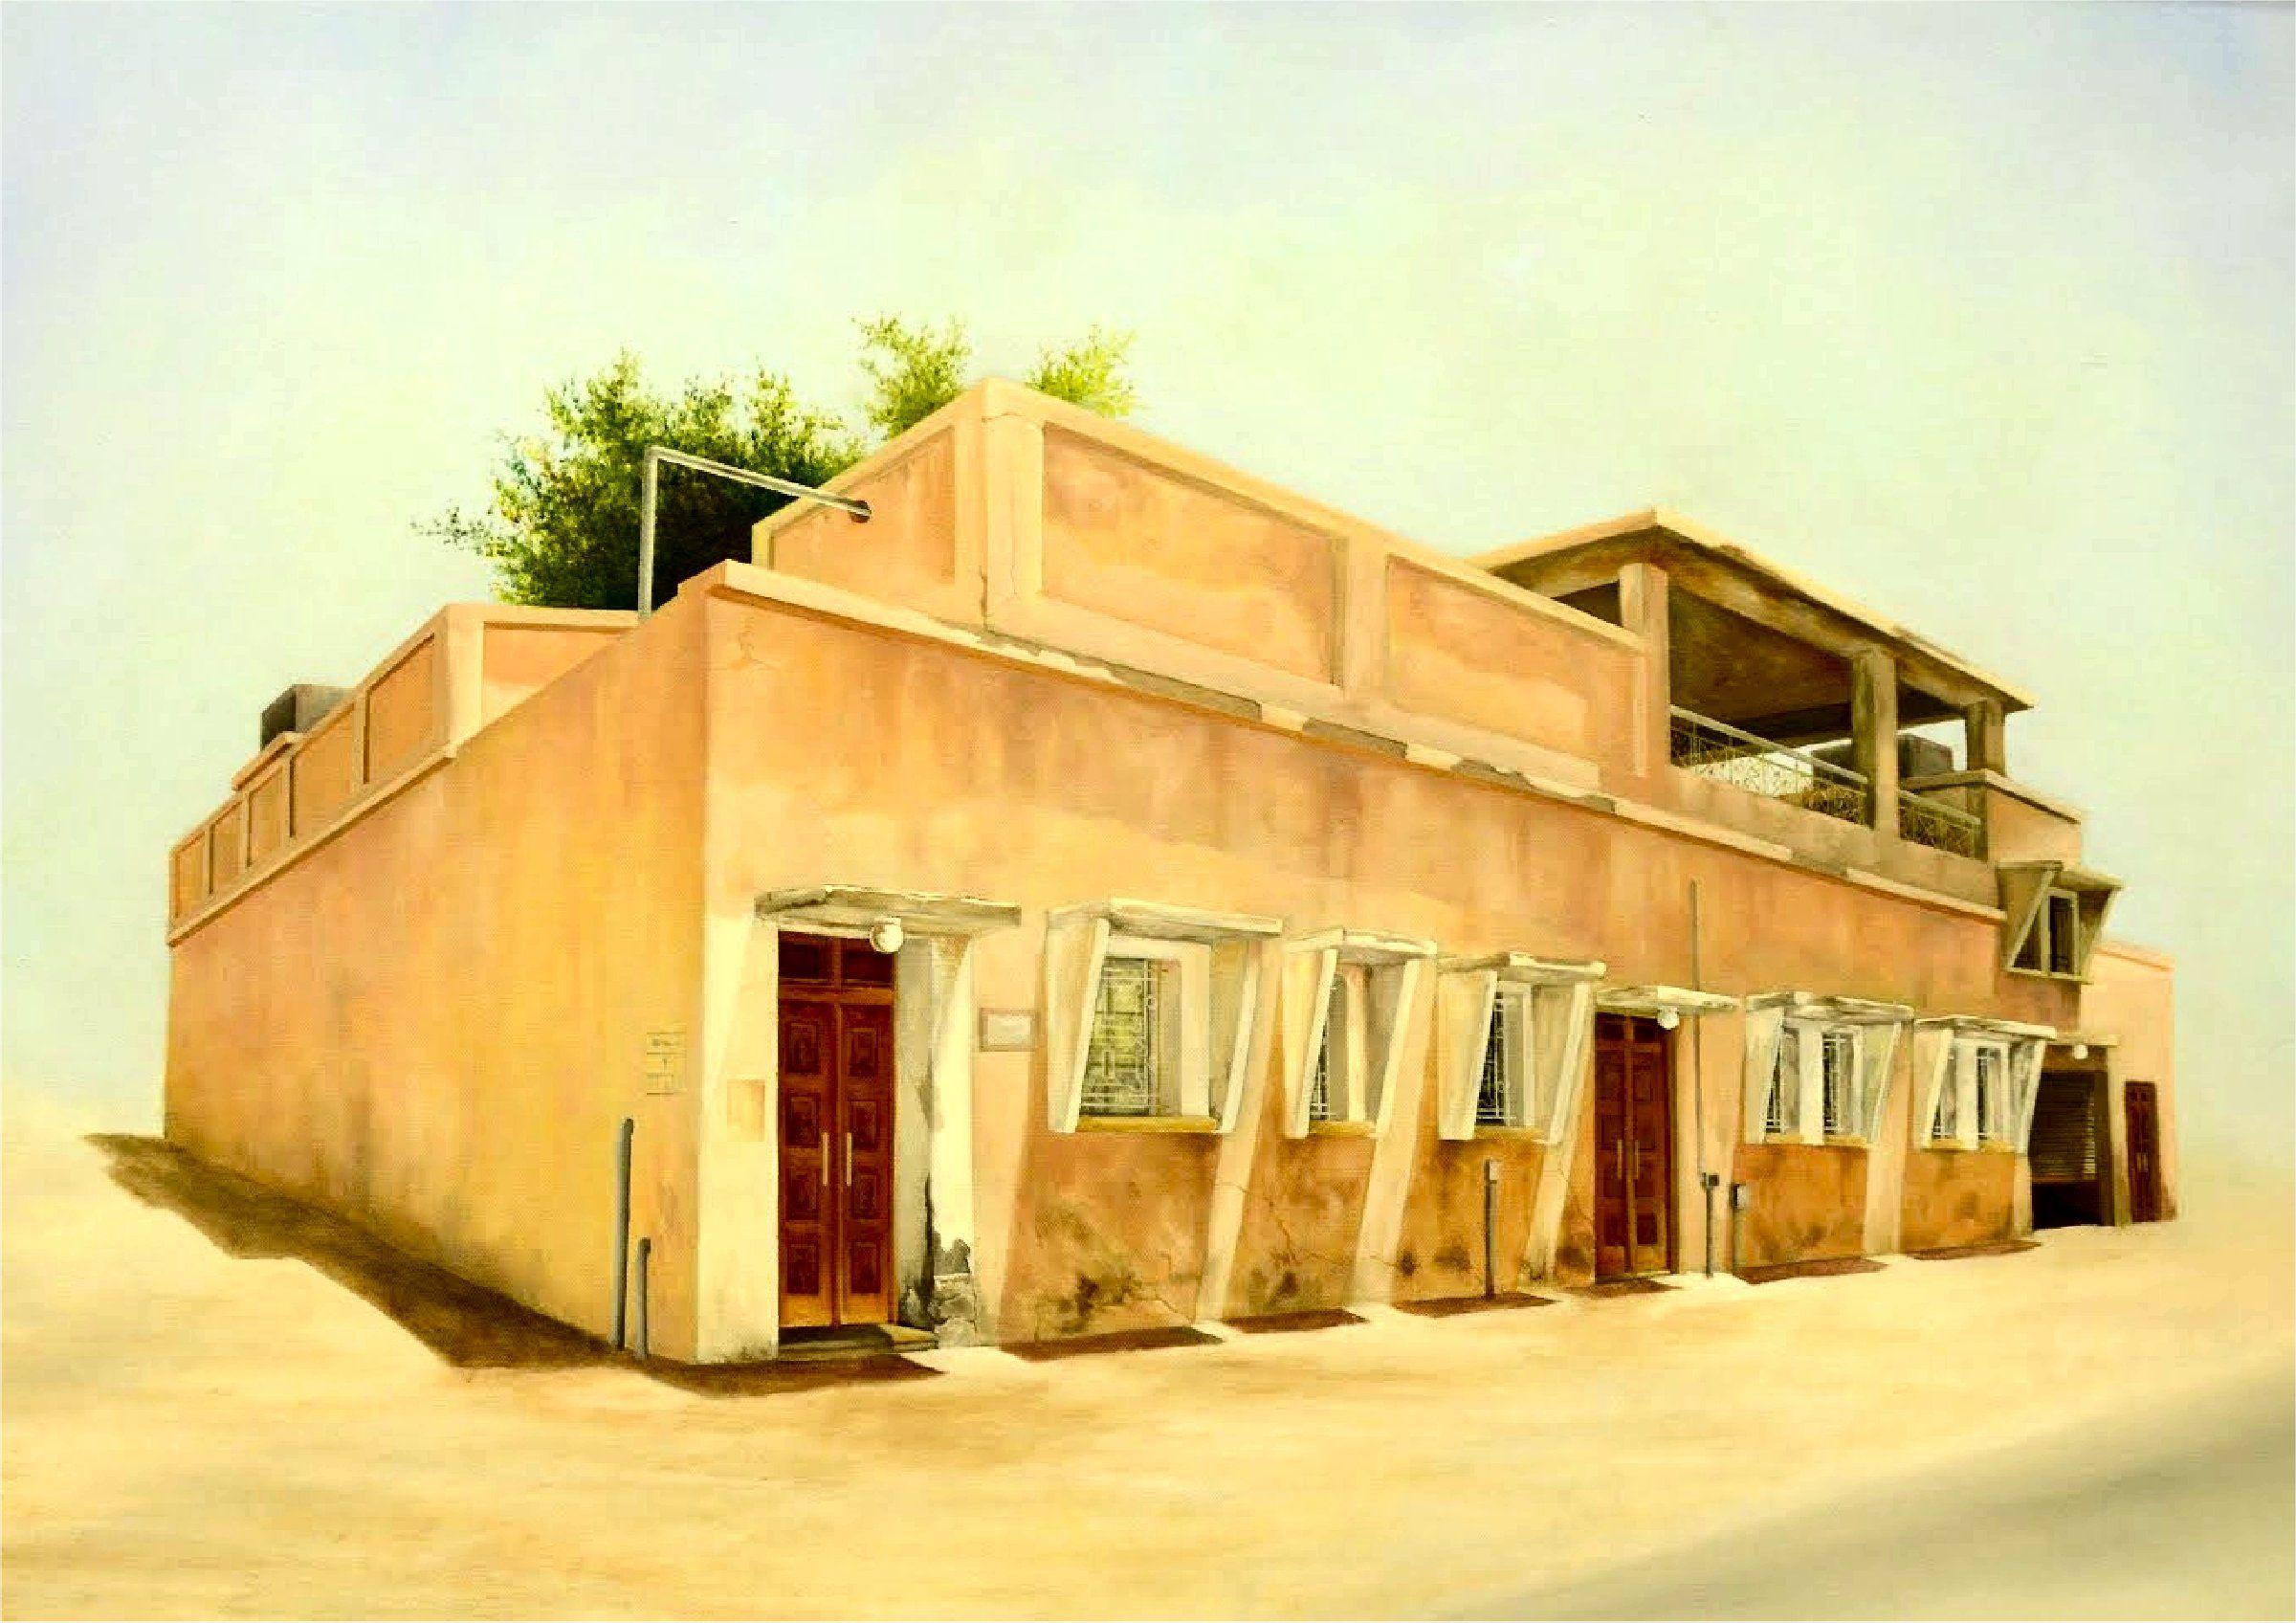 رسم بيوت قديمة Abstract Wallpaper Backgrounds Britto Art Islamic Artwork